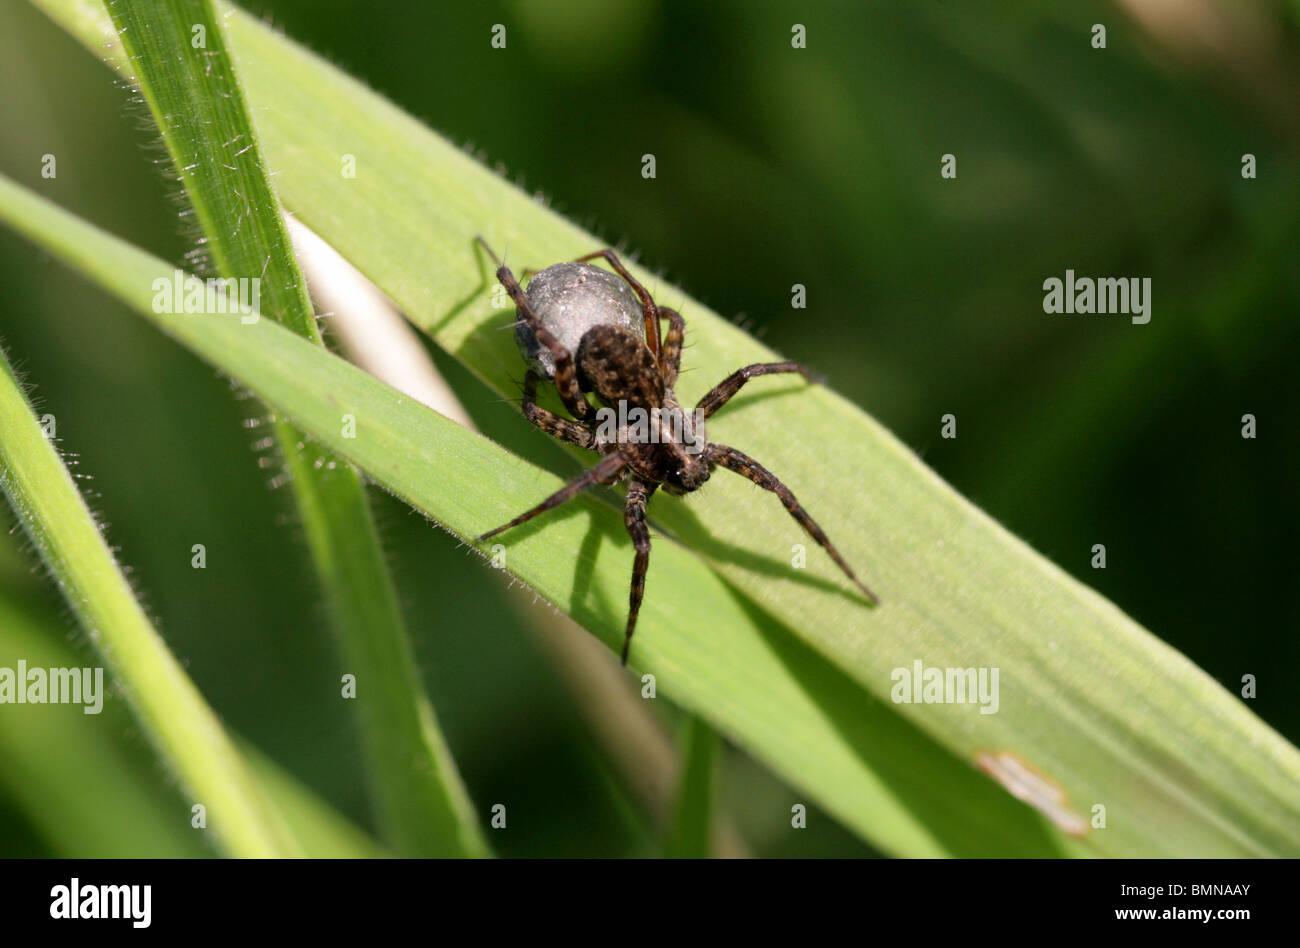 Female Wolf Spider with Egg Sack, Pardosa lugubris, Lycosidae (wolf spiders), Araneae (spiders), Arachnida - Stock Image